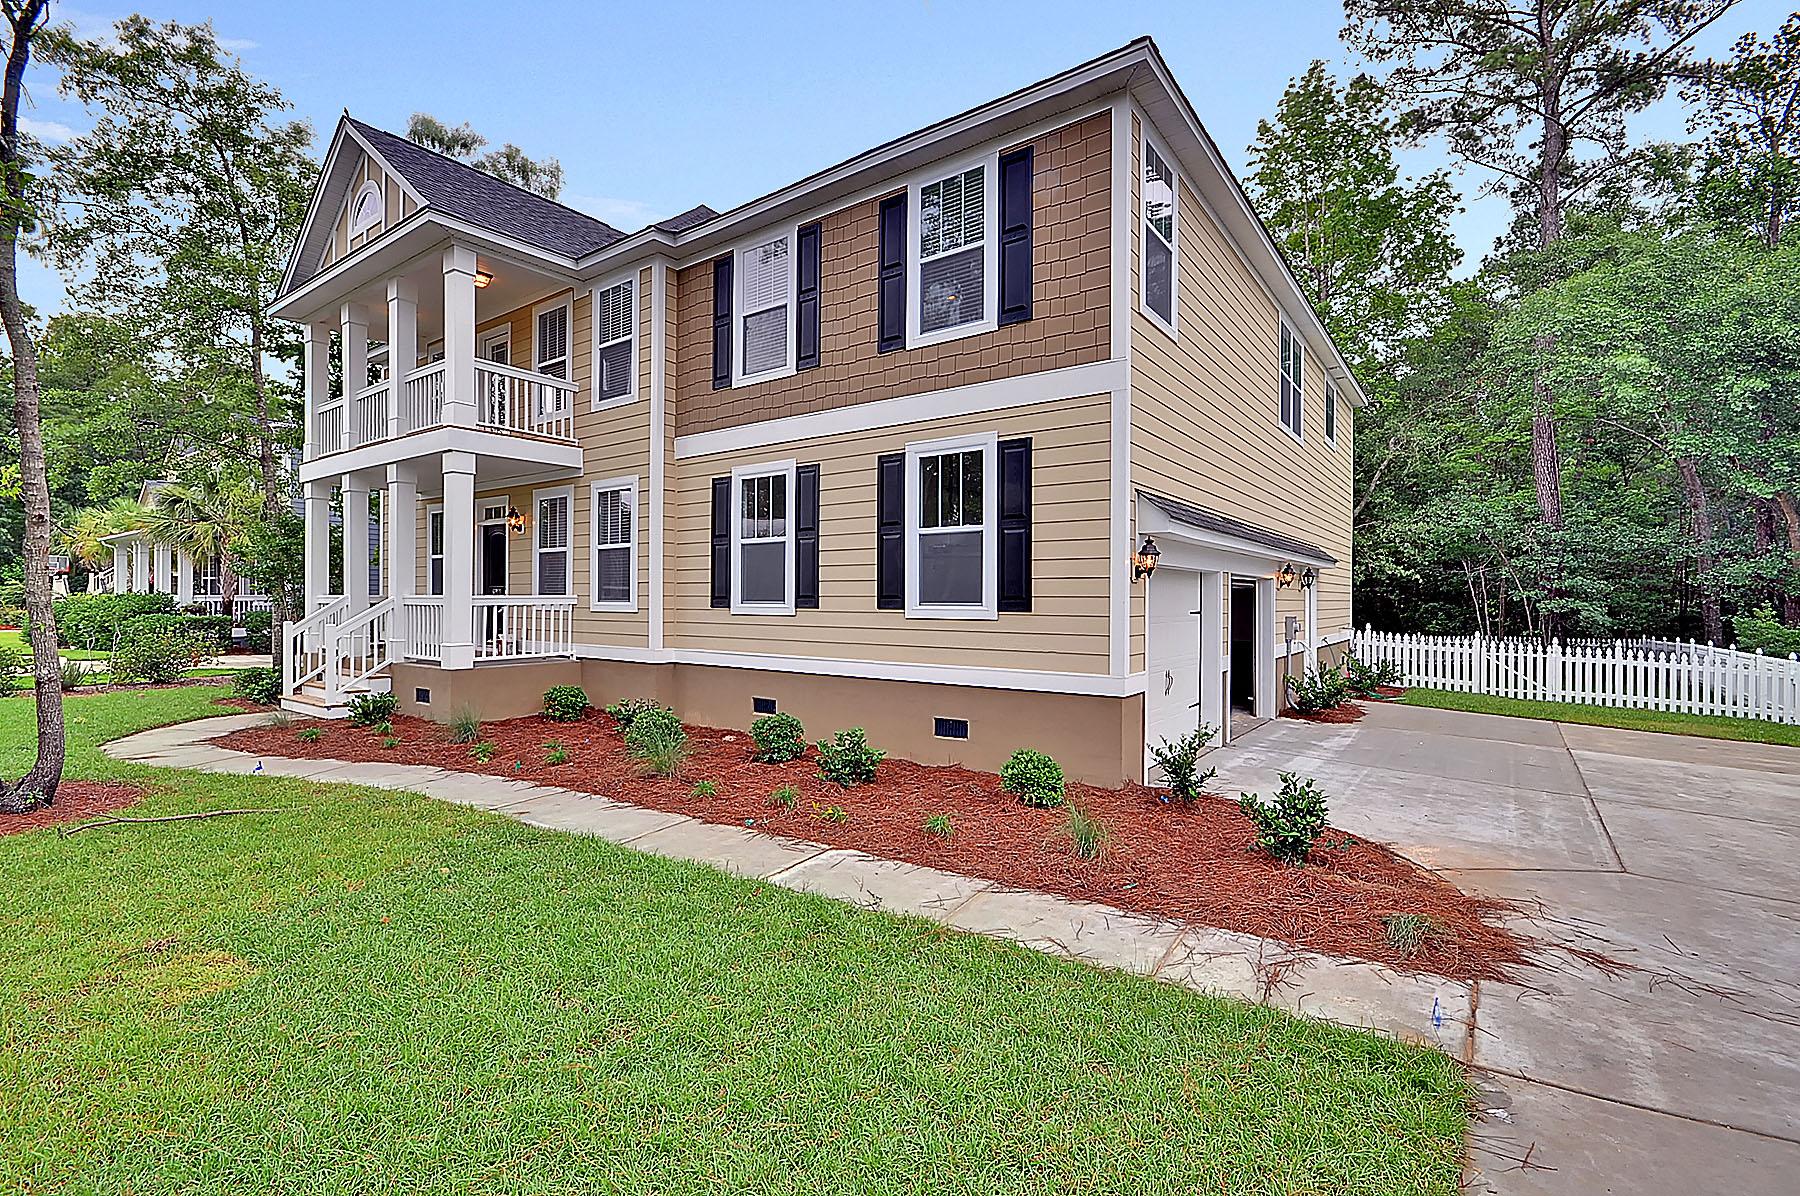 Plan Name or #:The Charleston Plan  Bed: 5  Baths: 4  Sq.Ft.: 4,027 - 4,140  Garage: 2 Car Side Entry Garage